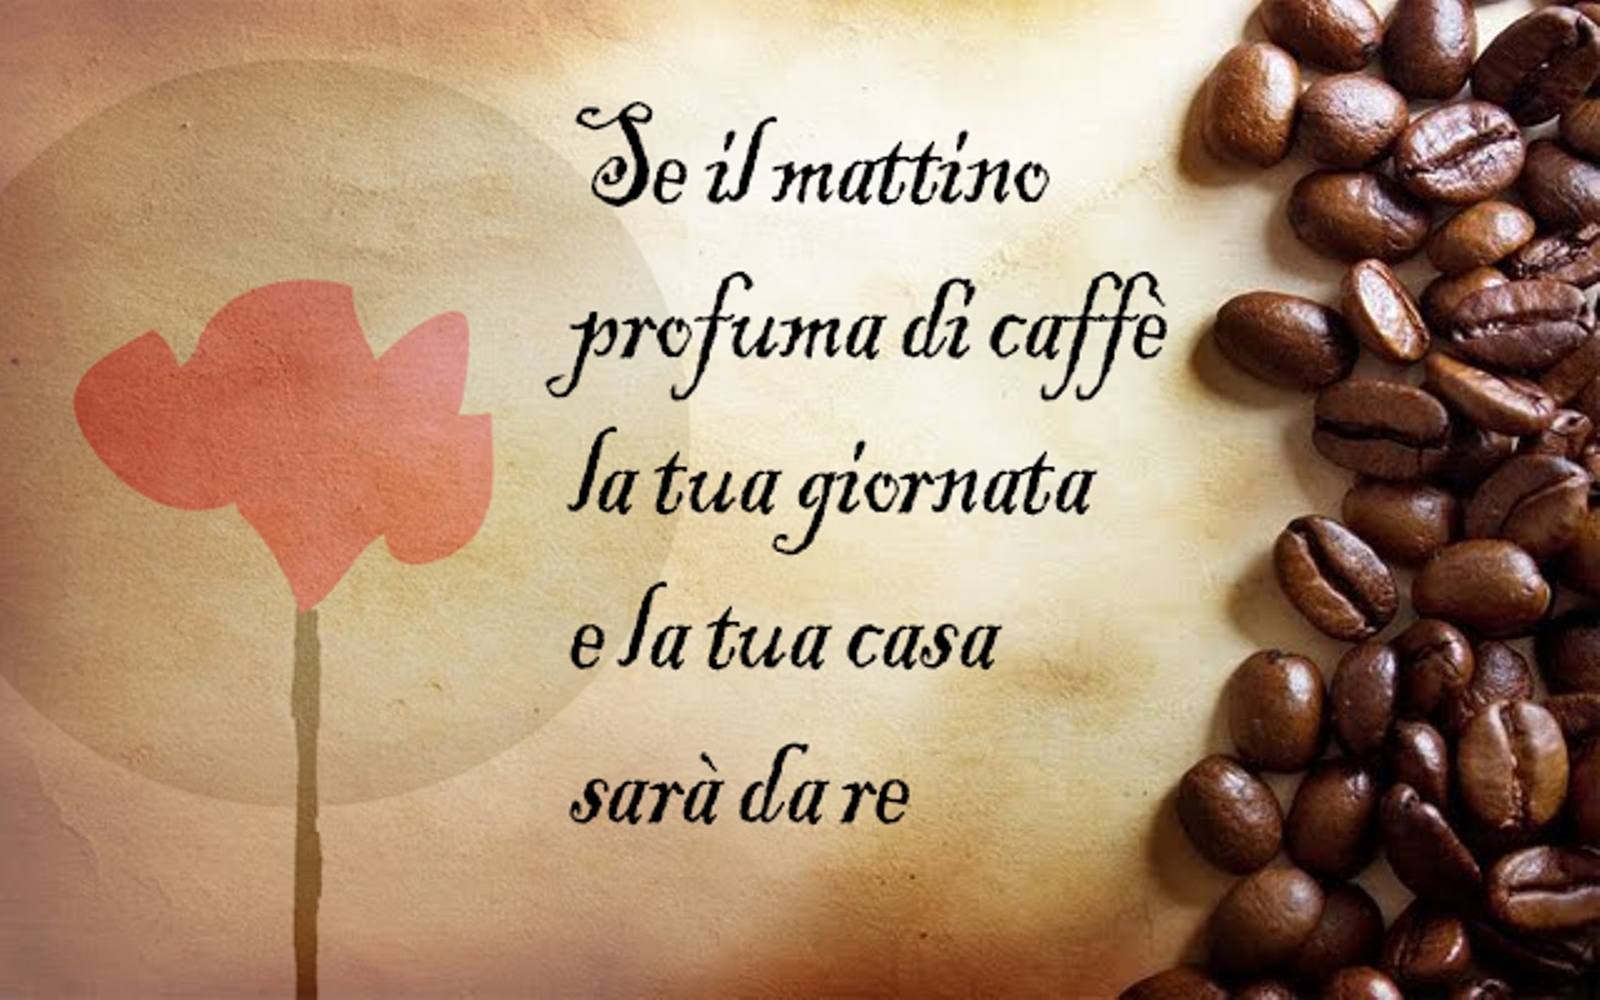 Estremamente Aforismi sul caffè SL86